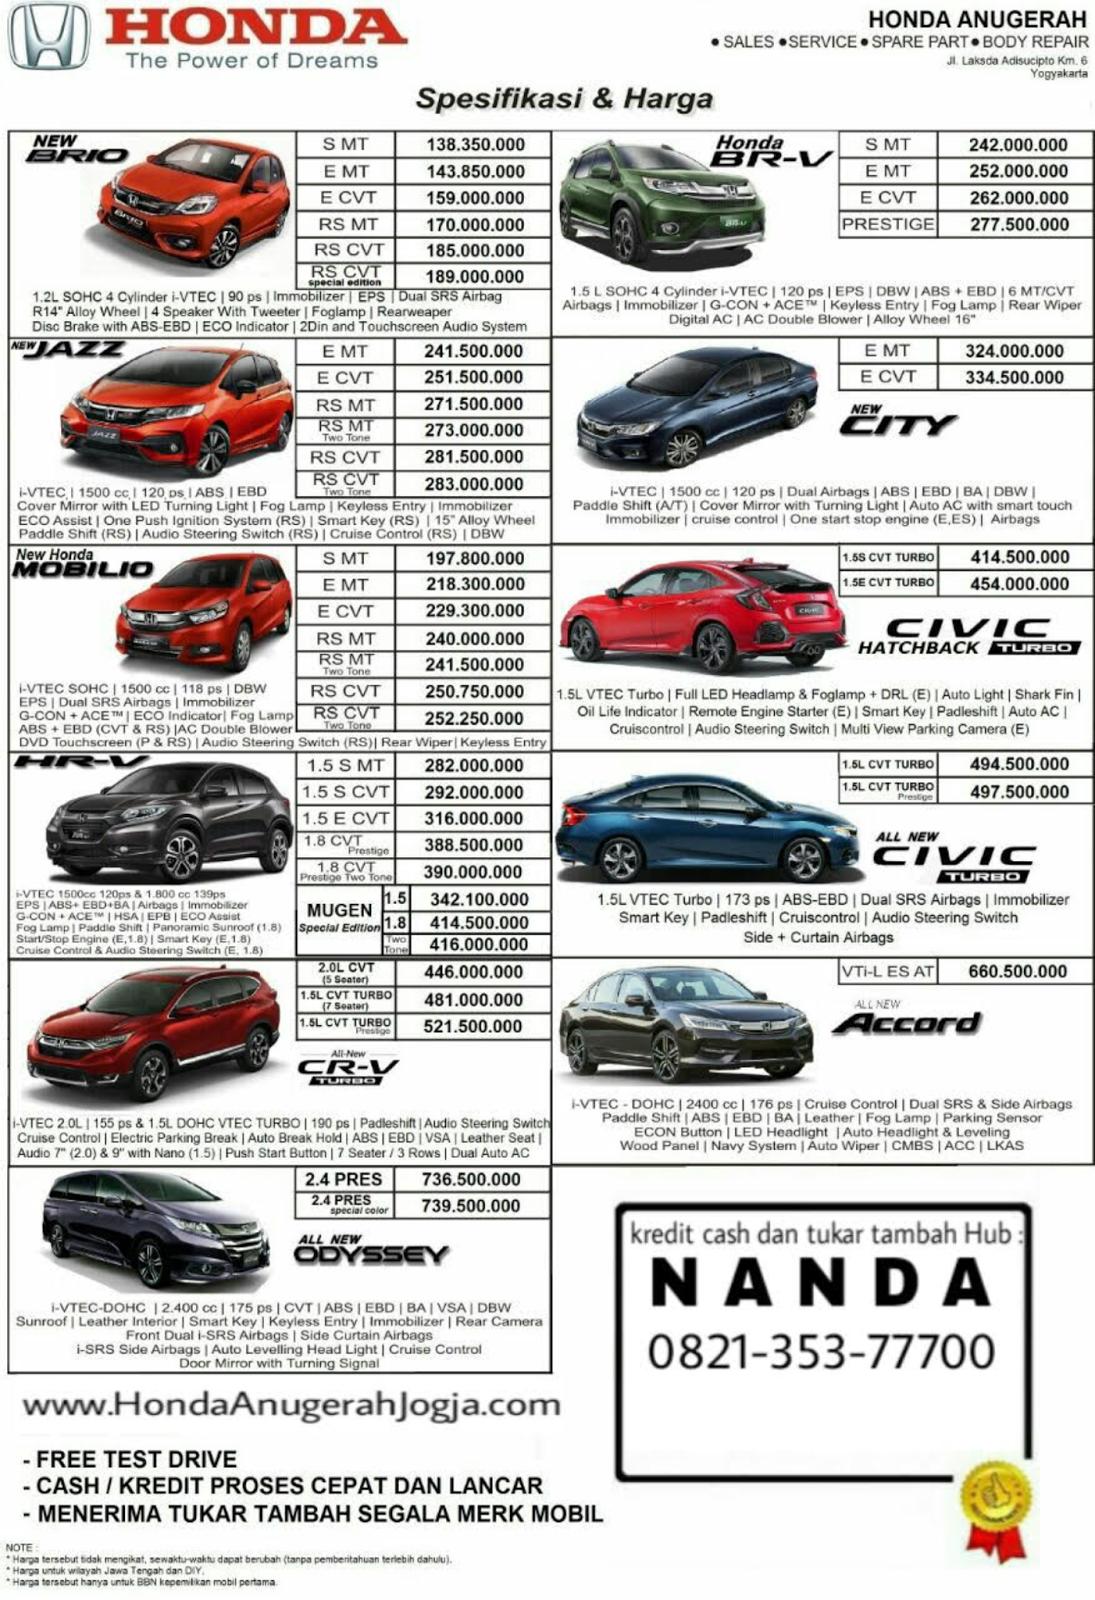 Harga Mobil Baru Honda 2017 Terbaru Di Jogja Honda Anugerah Jogja